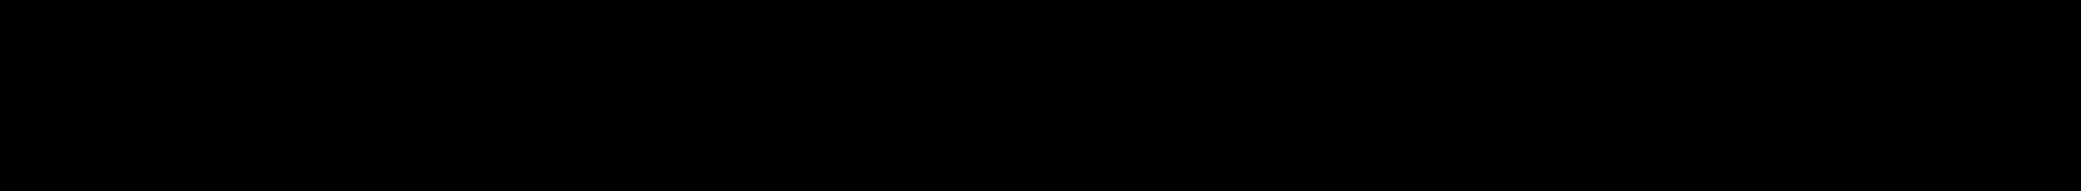 Design System G 700R